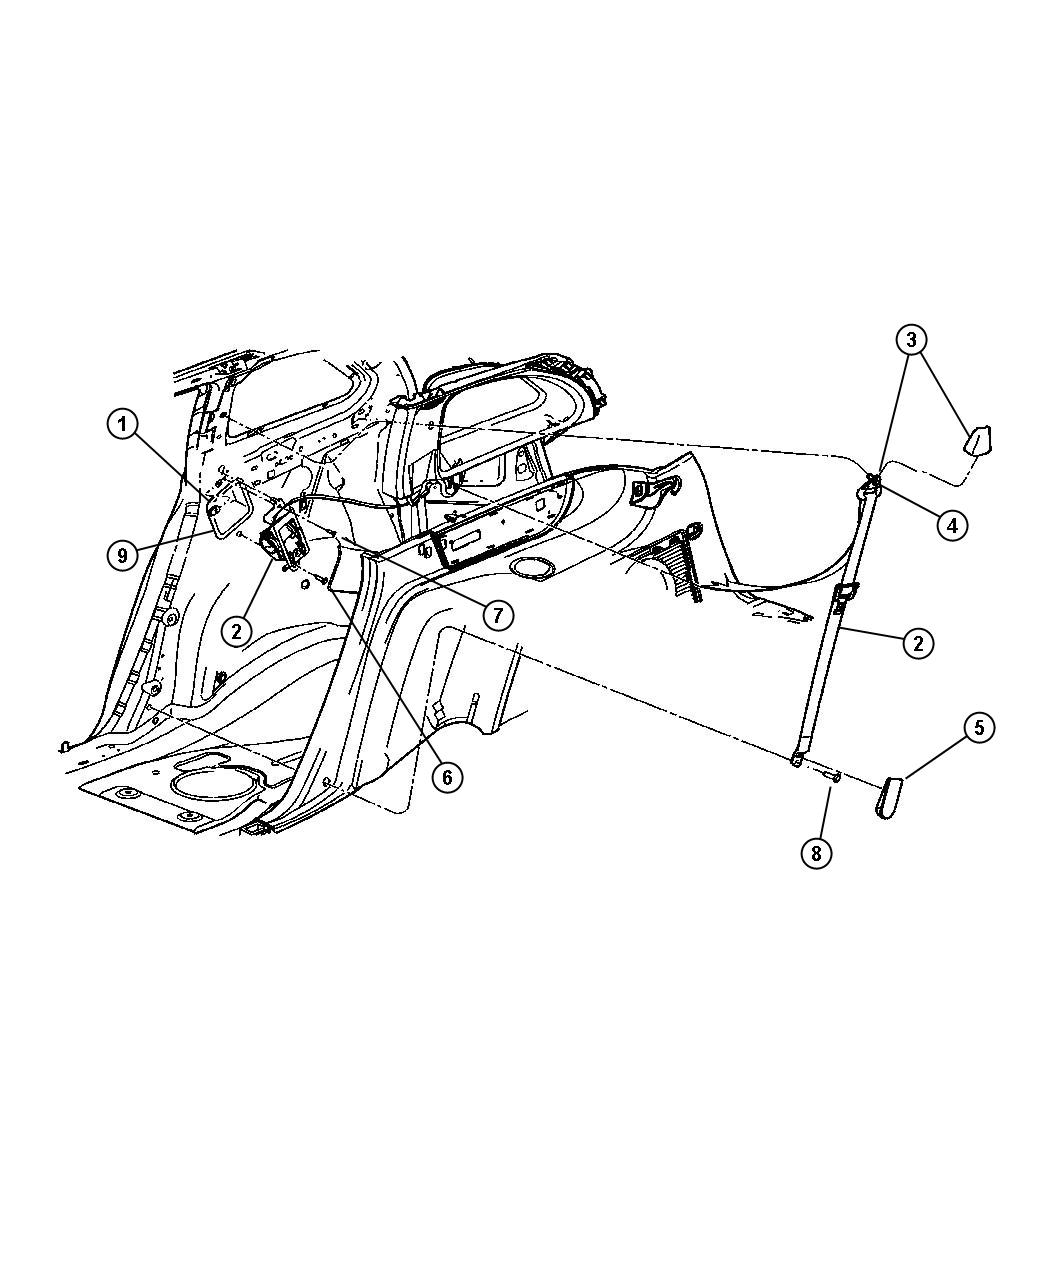 Chrysler Pacifica Seat Belt Rear Left Trim All Trim Codes Color Pastel Slate Gray